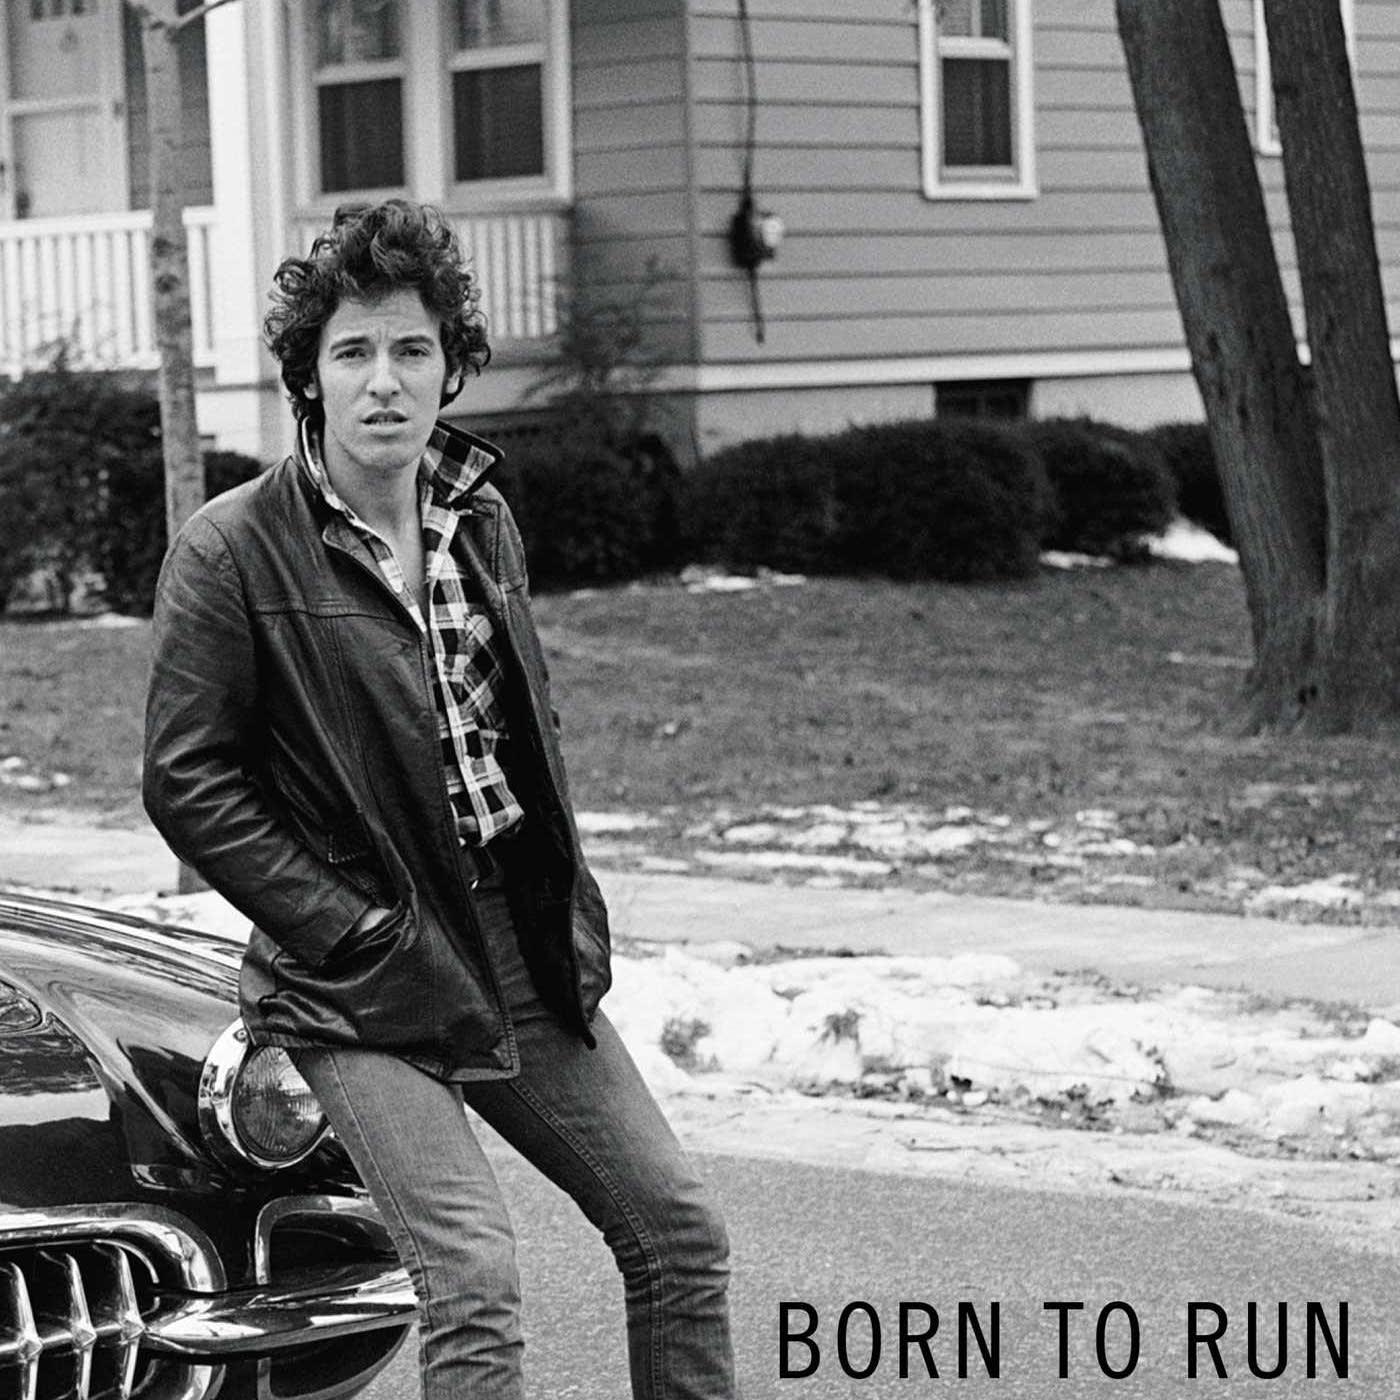 Bruce Springsteen's memoir 'Born to Run'